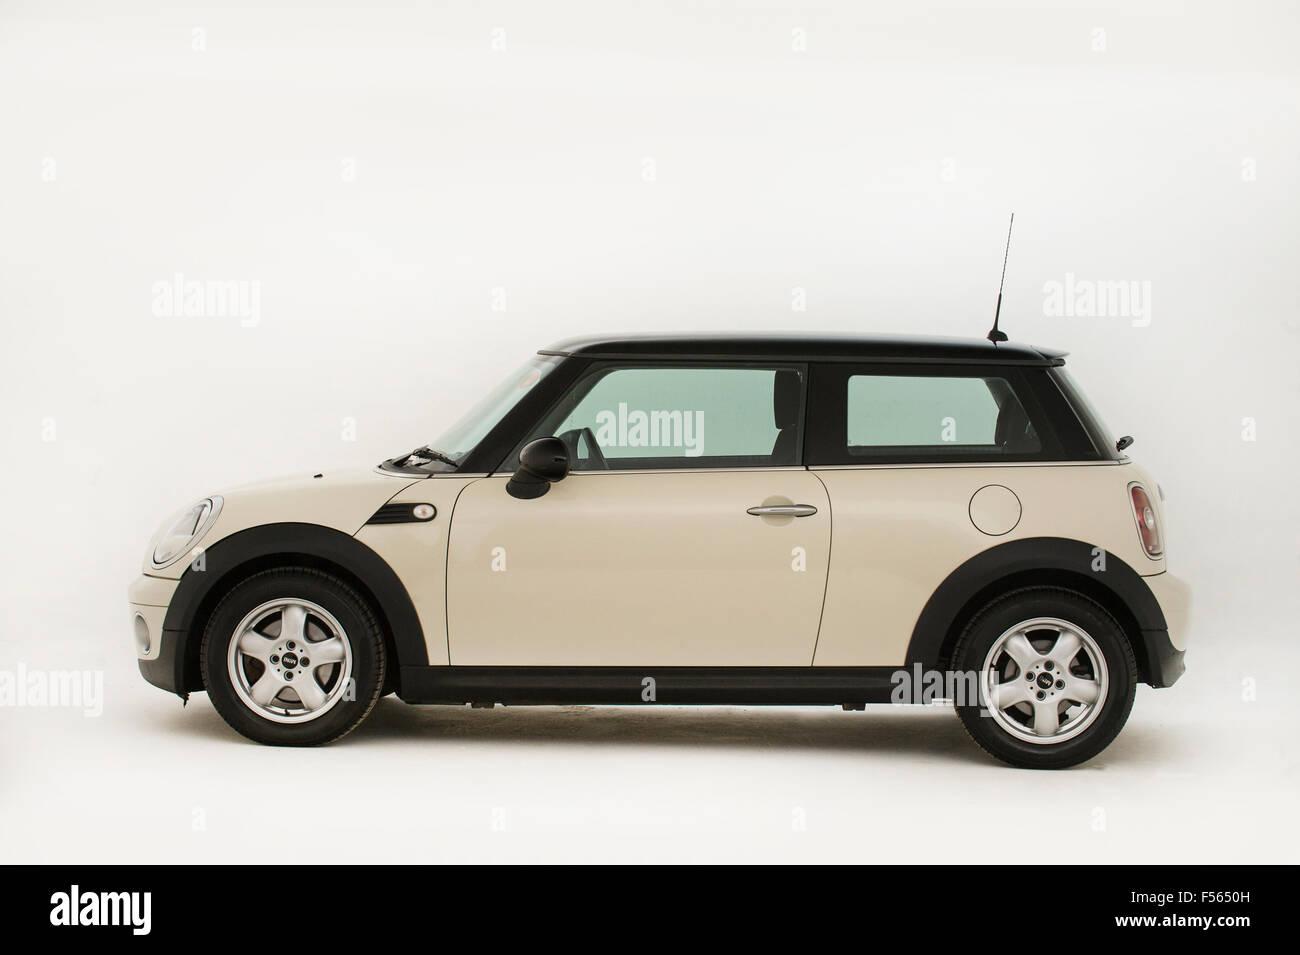 2009 Mini Cooper - Stock Image